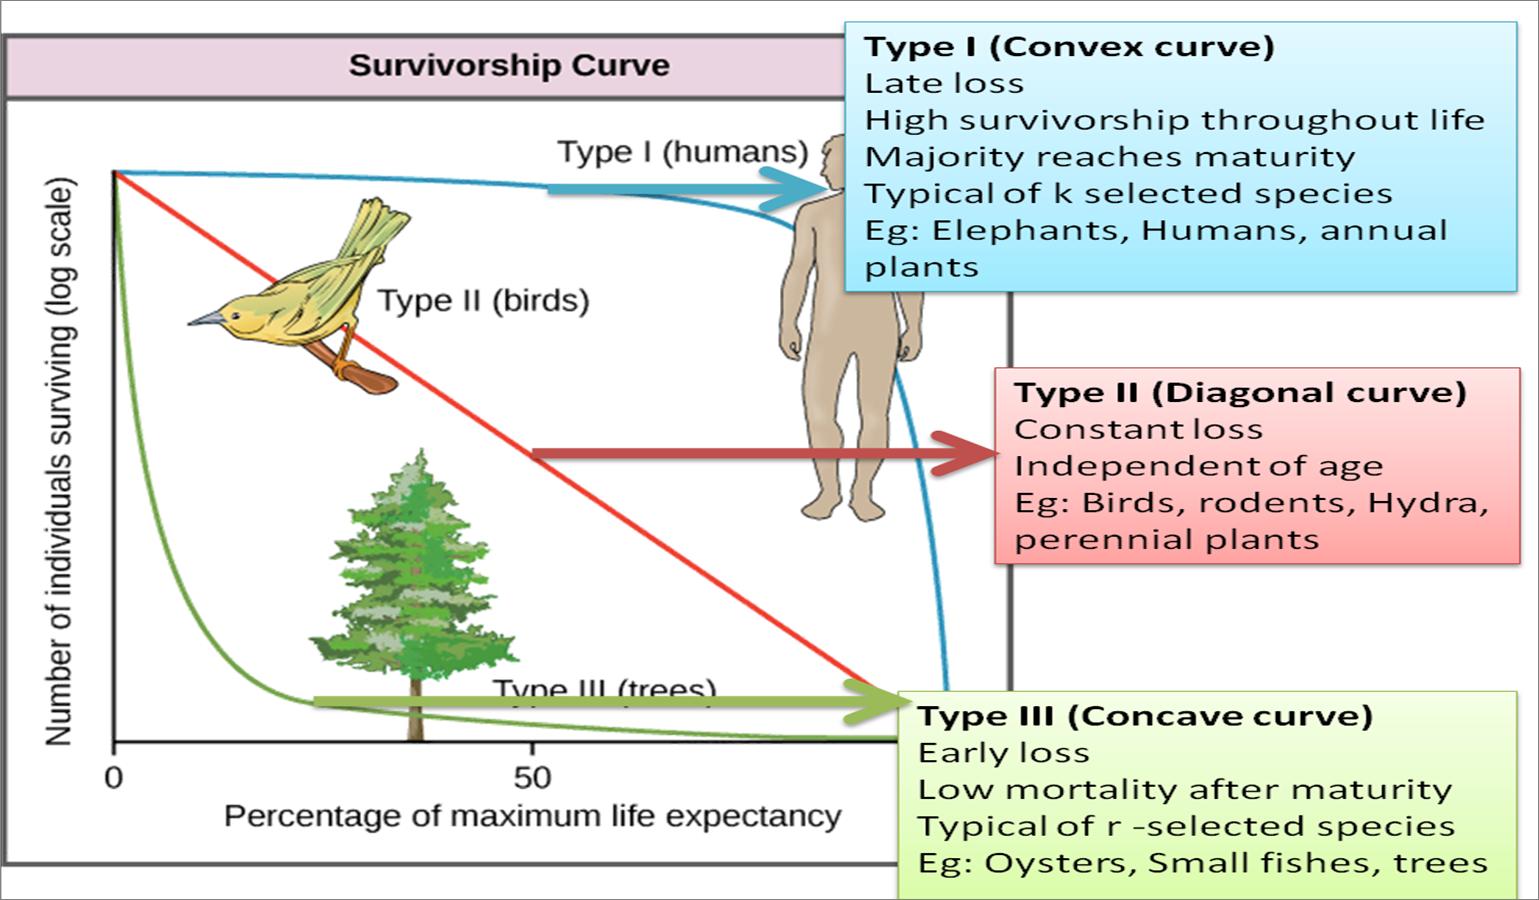 3 Types of survivorship curves